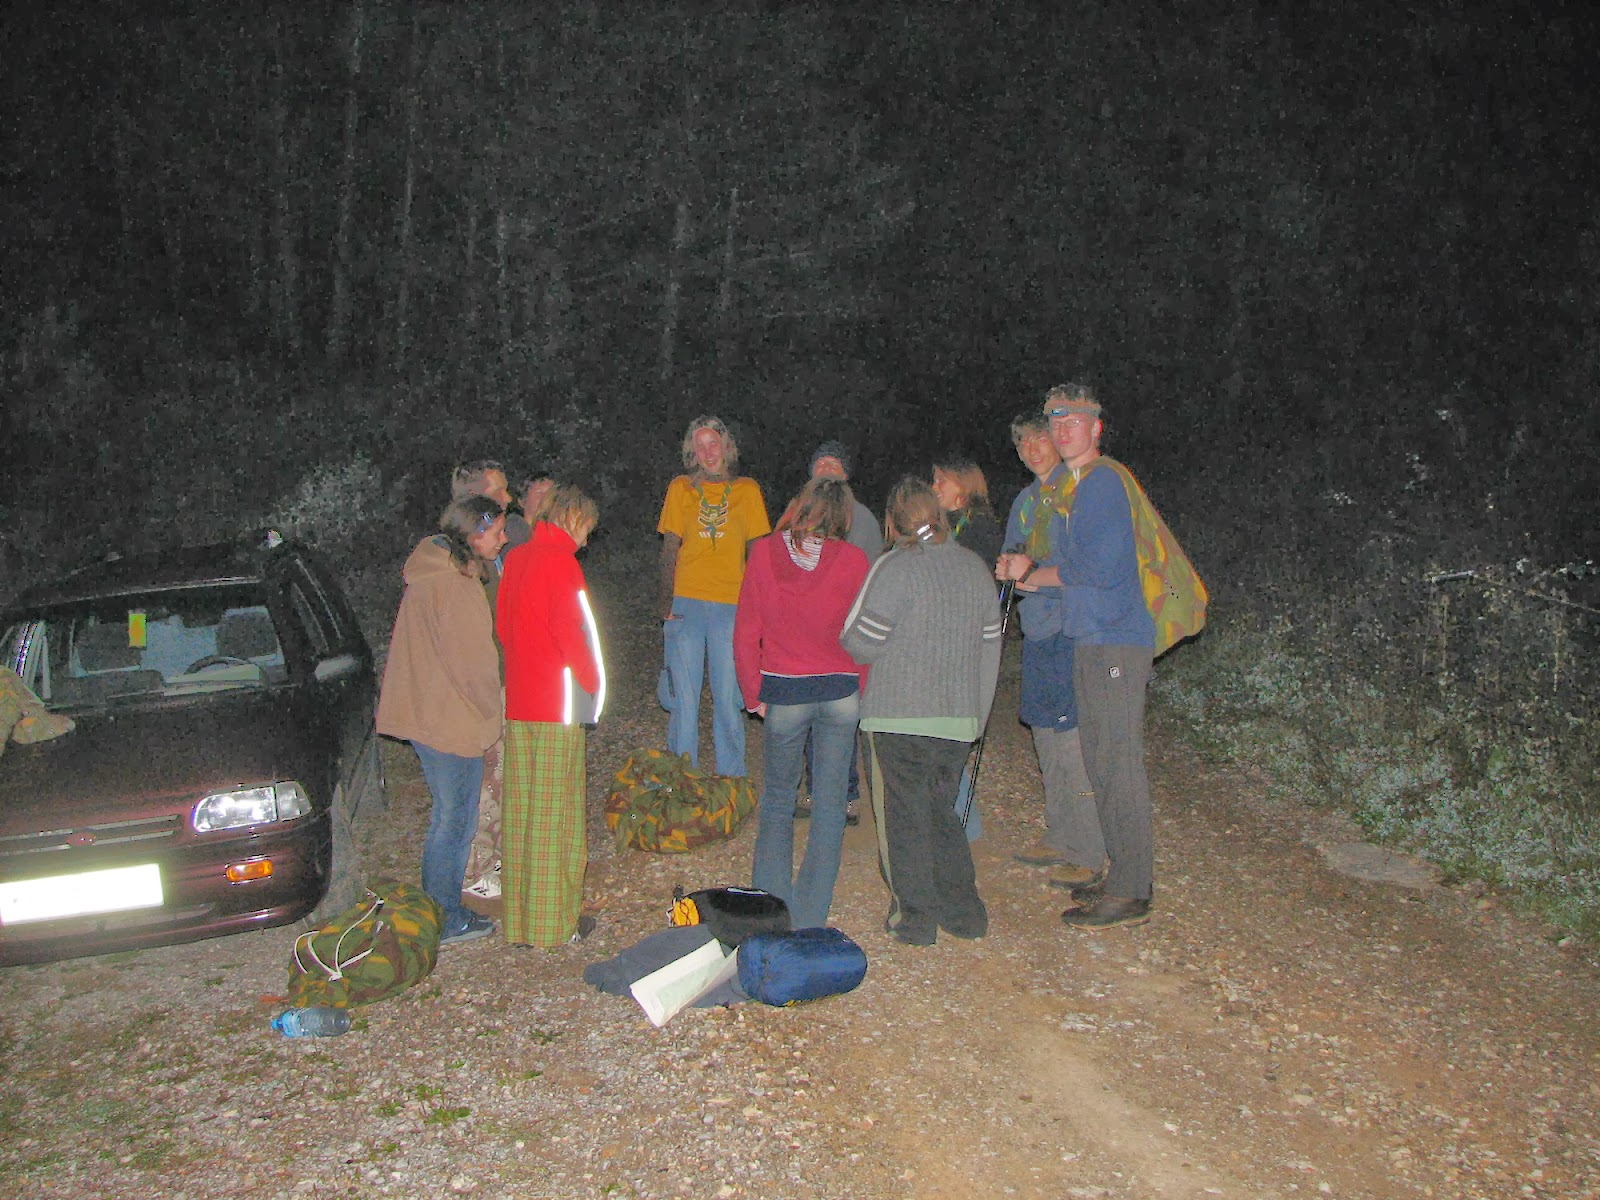 Prehod PP, Ilirska Bistrica 2005 - picture%2B029.jpg